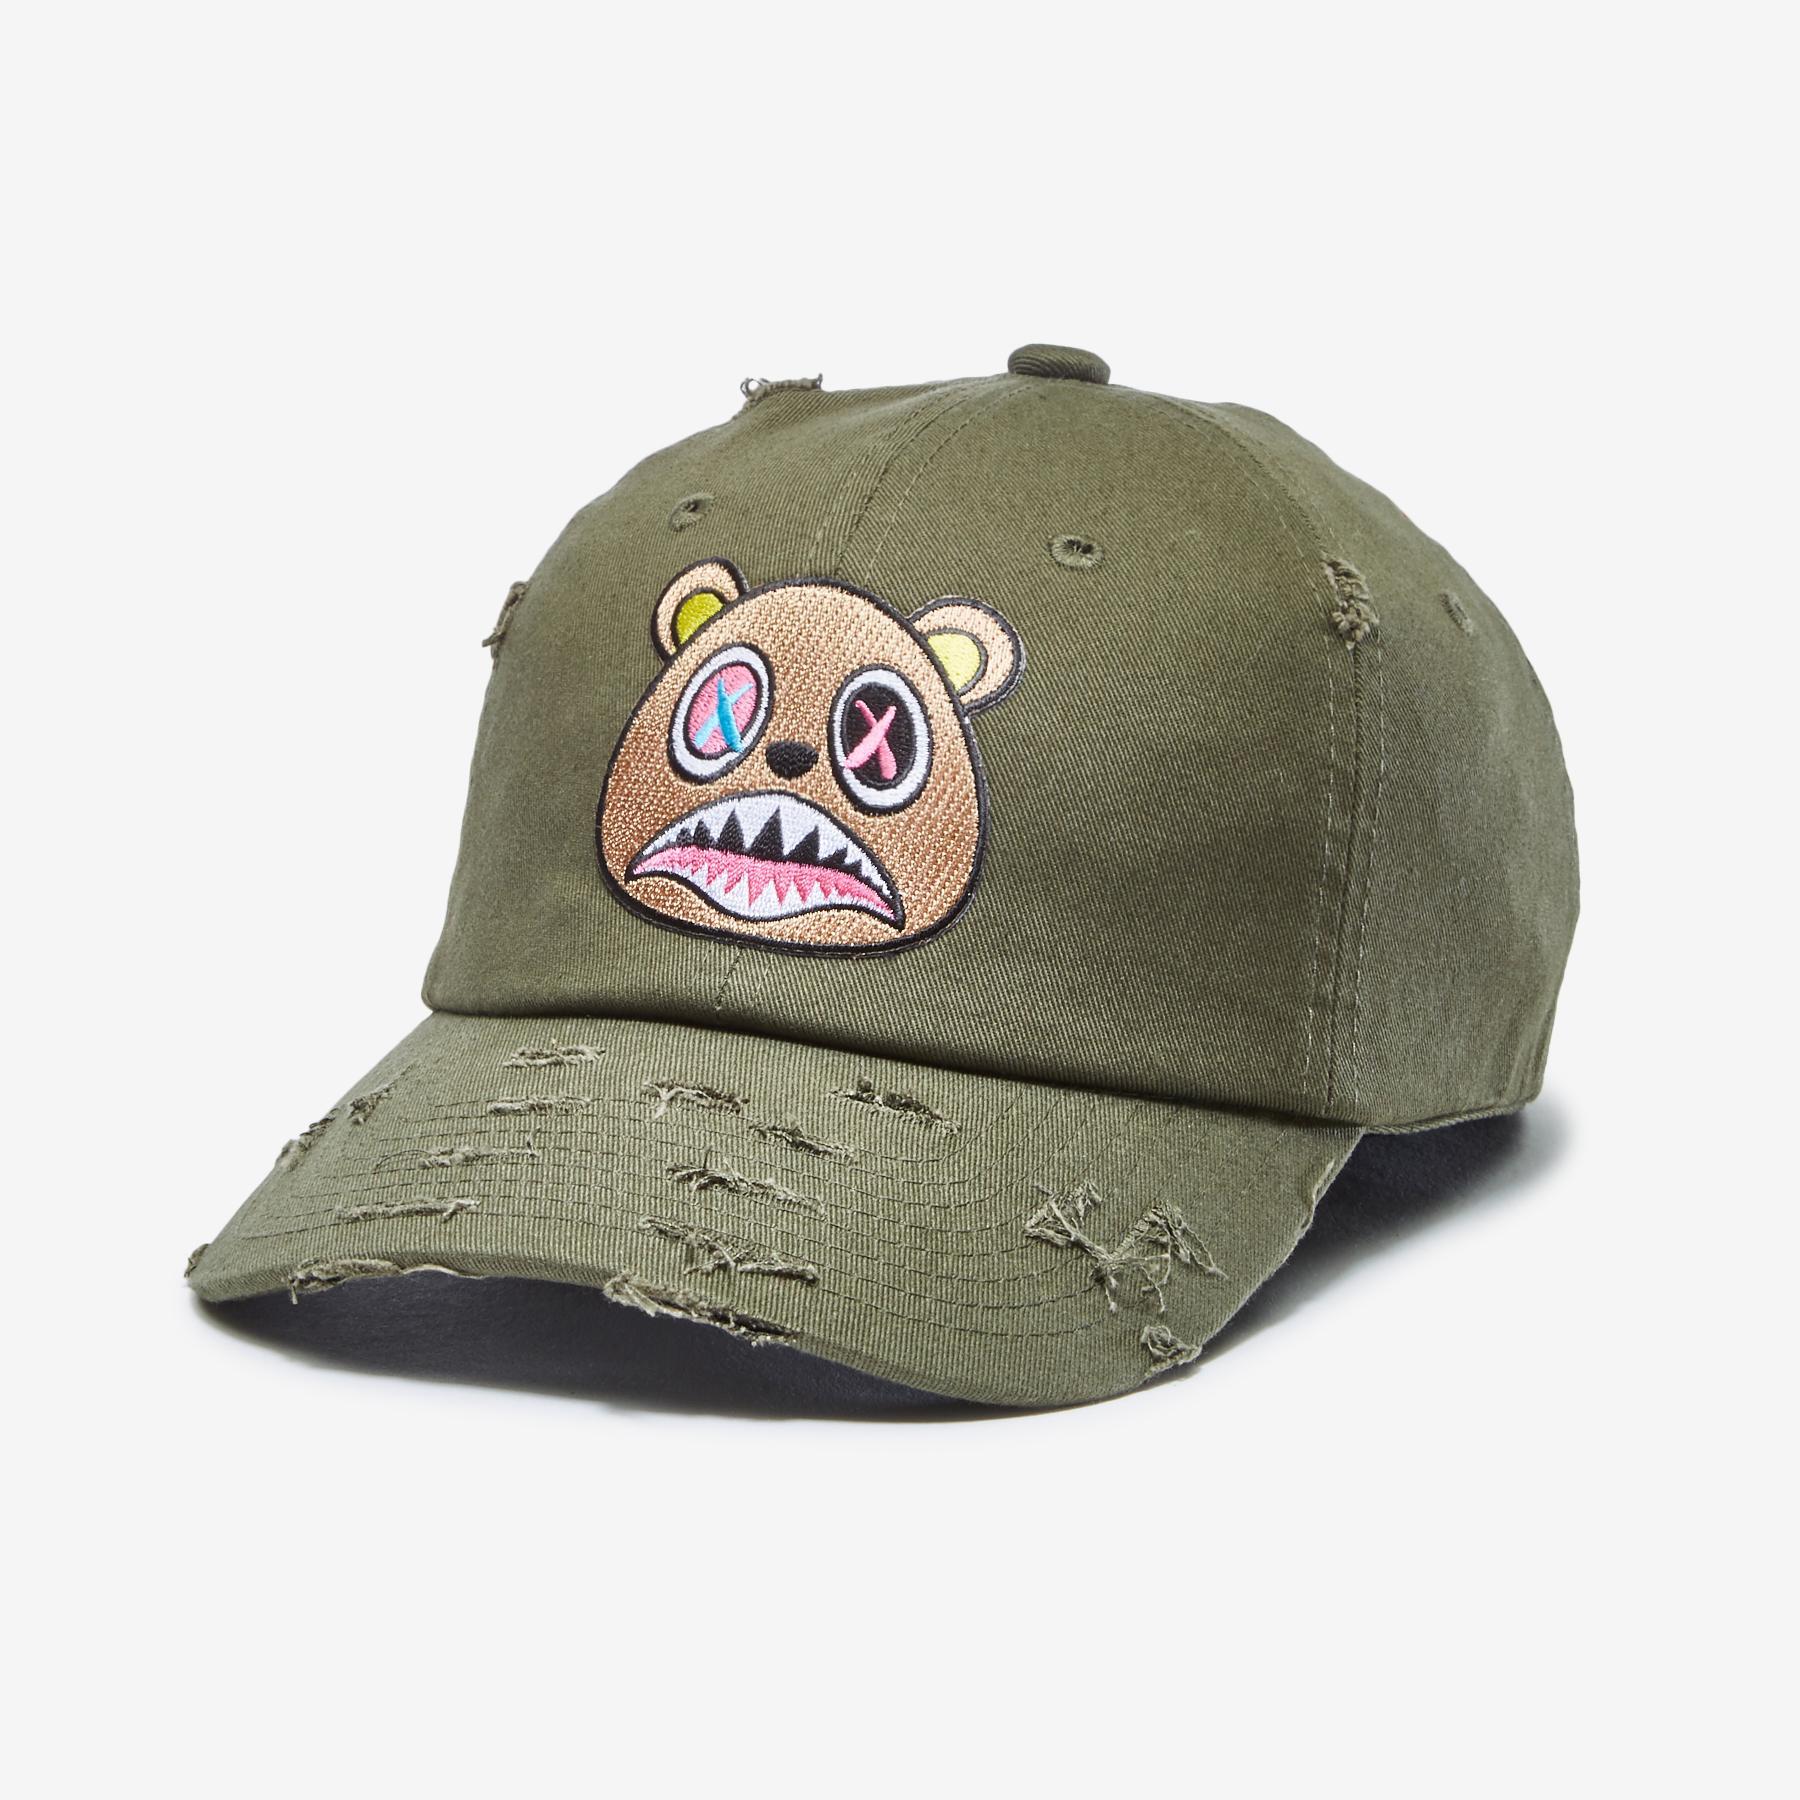 Crazy Baws Hat